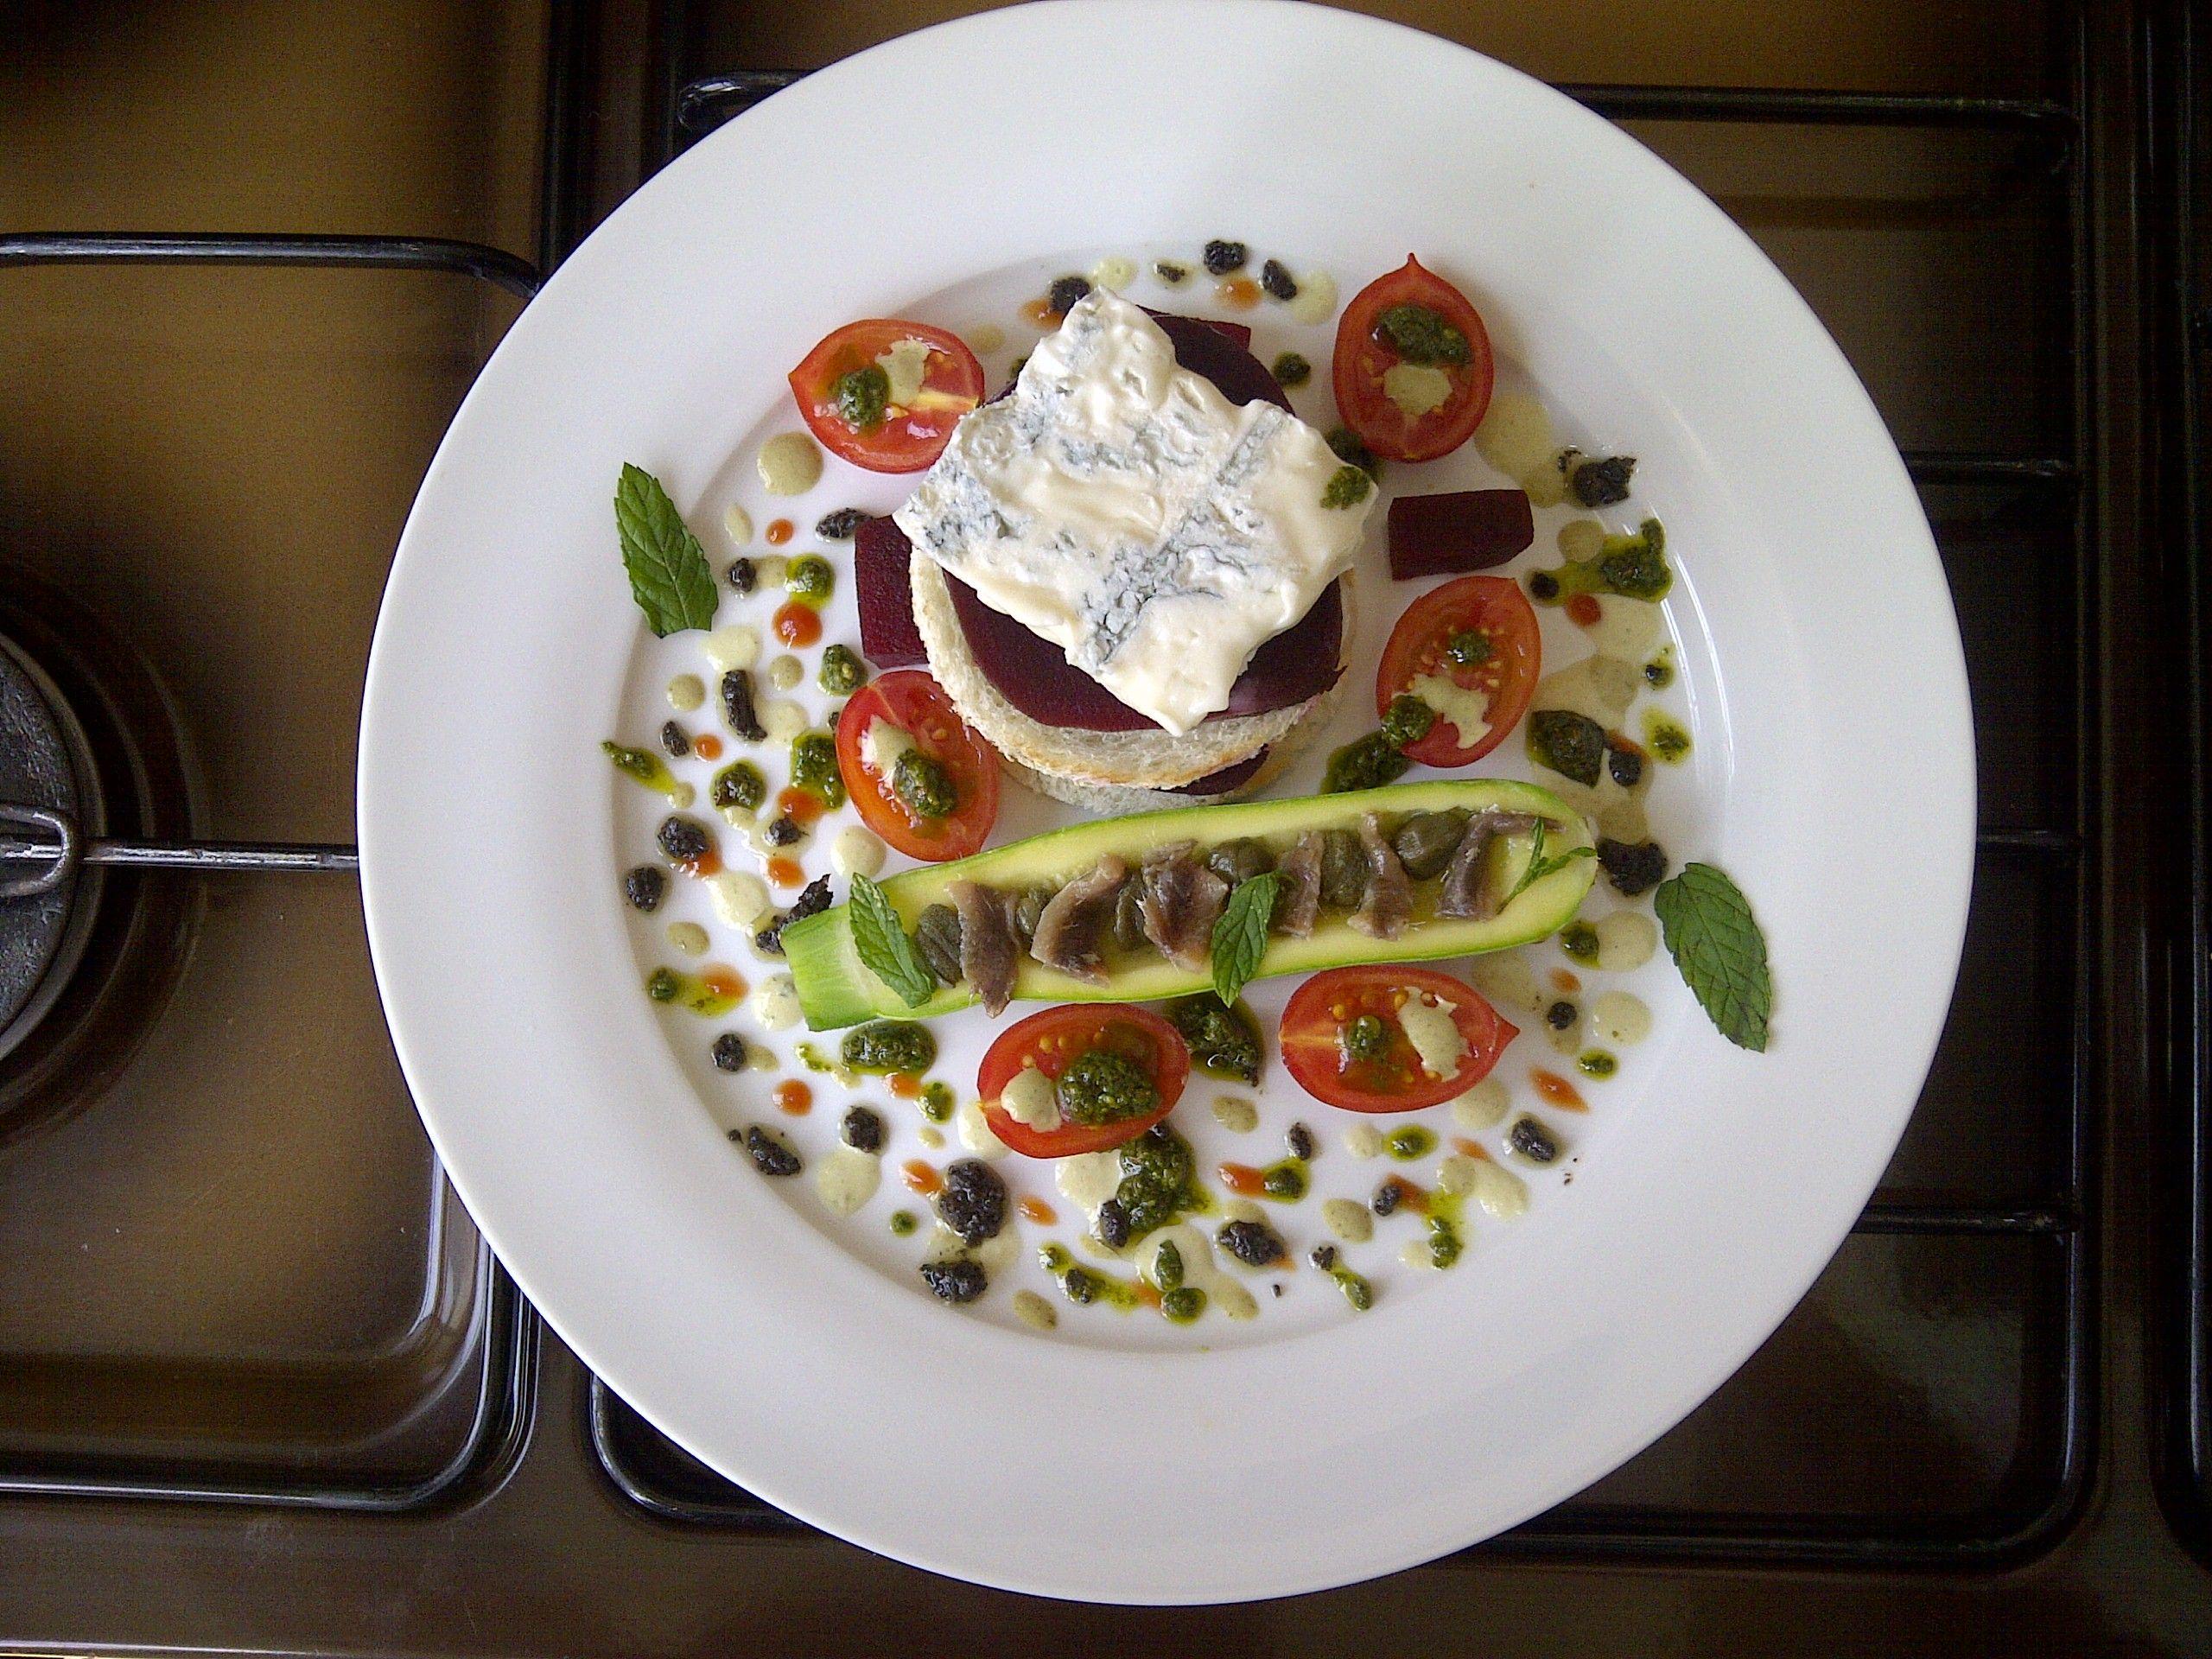 Dans   betterave  fromage  gorgonzola  courgettes  tomates   sauce  et    tant    autre   Gino D'Aquino